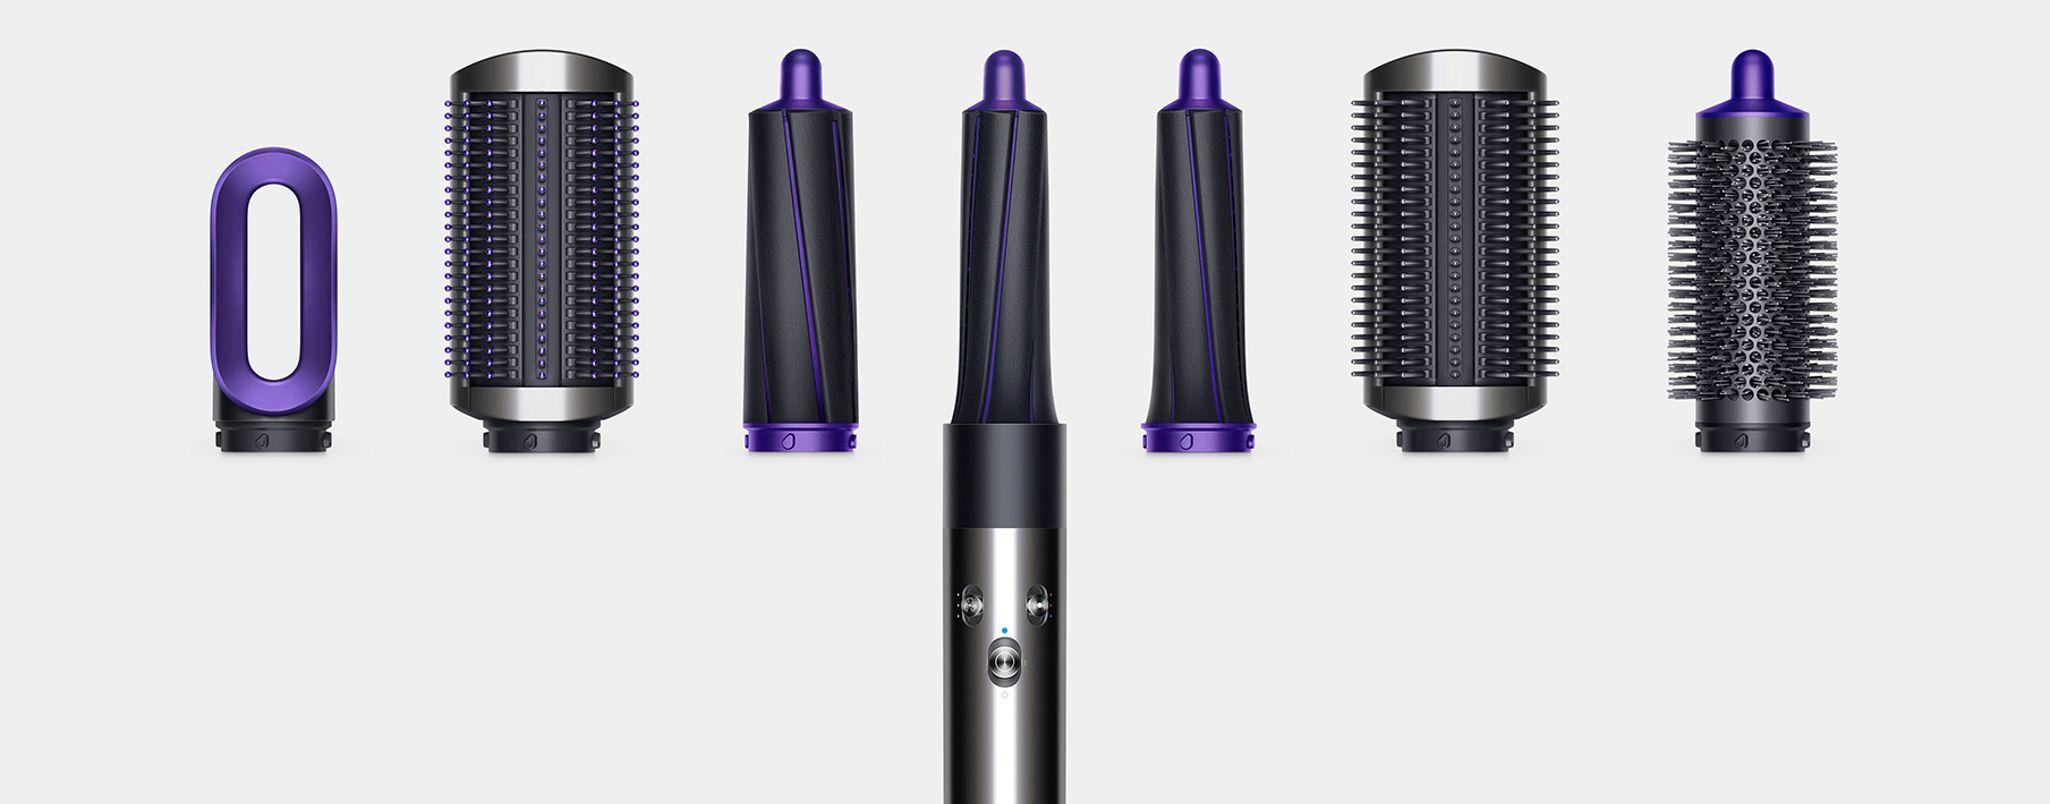 Dyson Airwrap™ attachments Hair styler, Hair tools, Wet hair